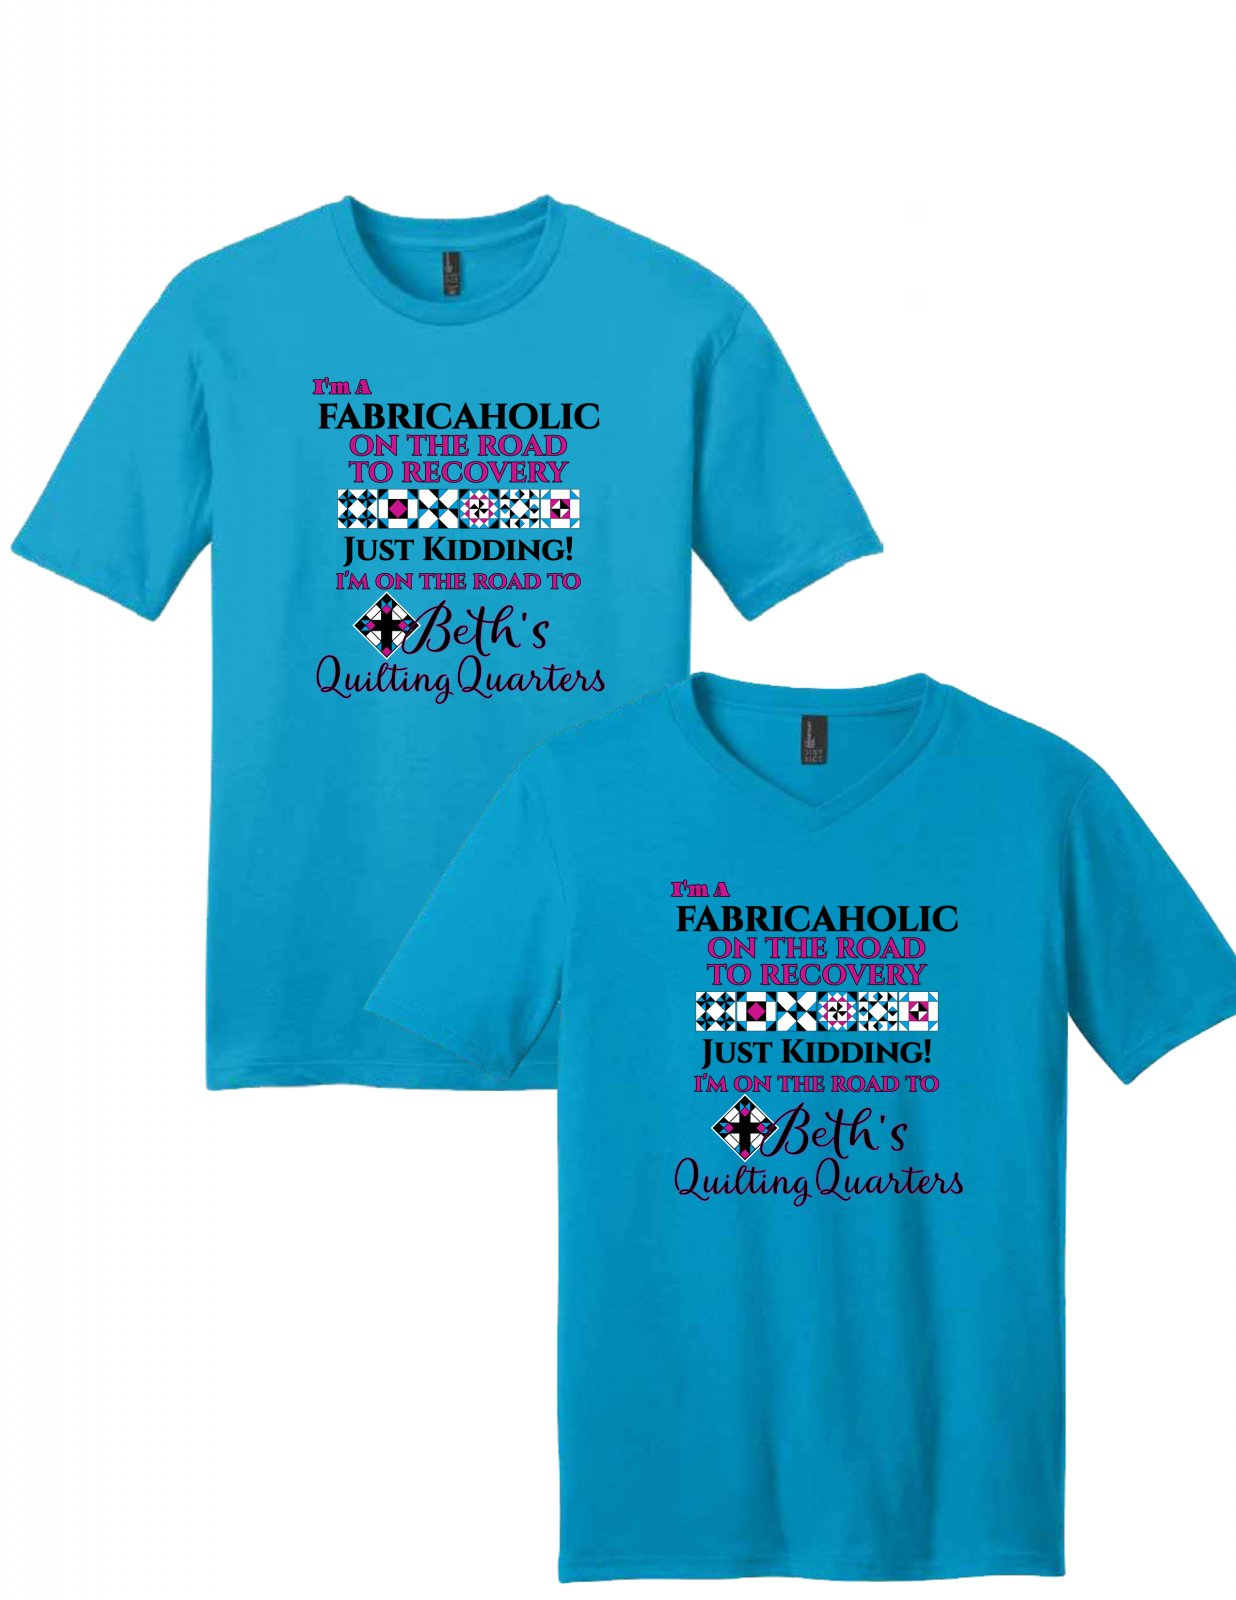 Fabricaholic T-shirt